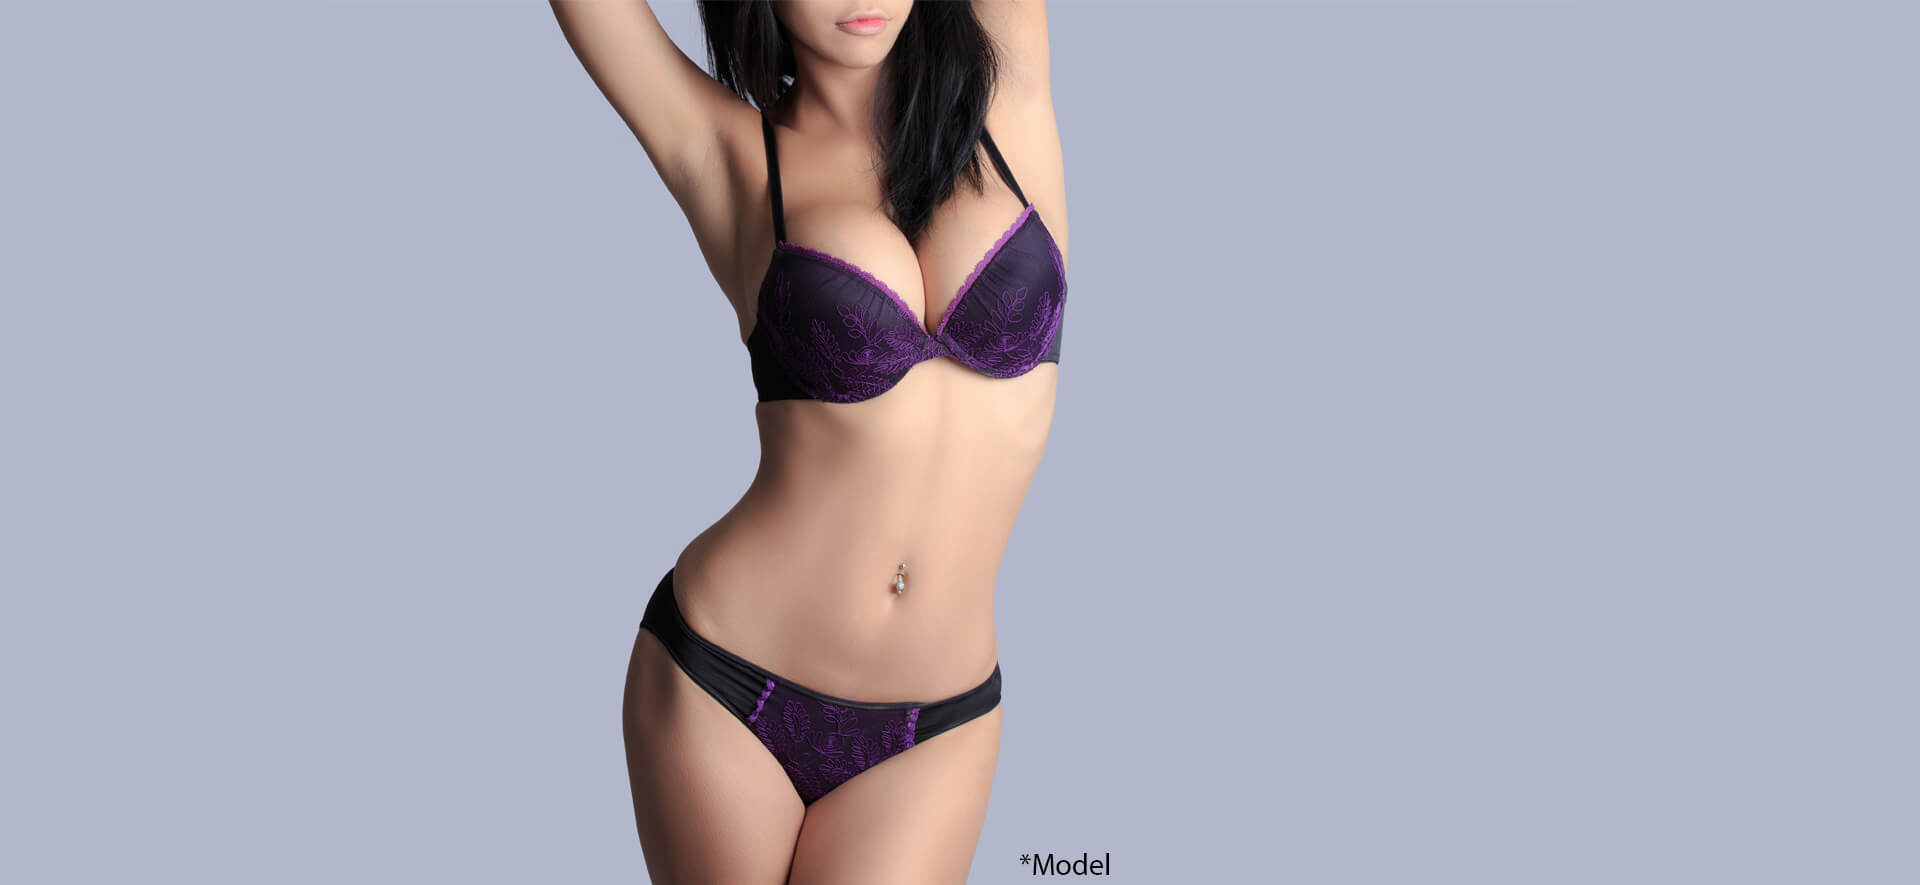 Beautiful slim body of woman in grey background